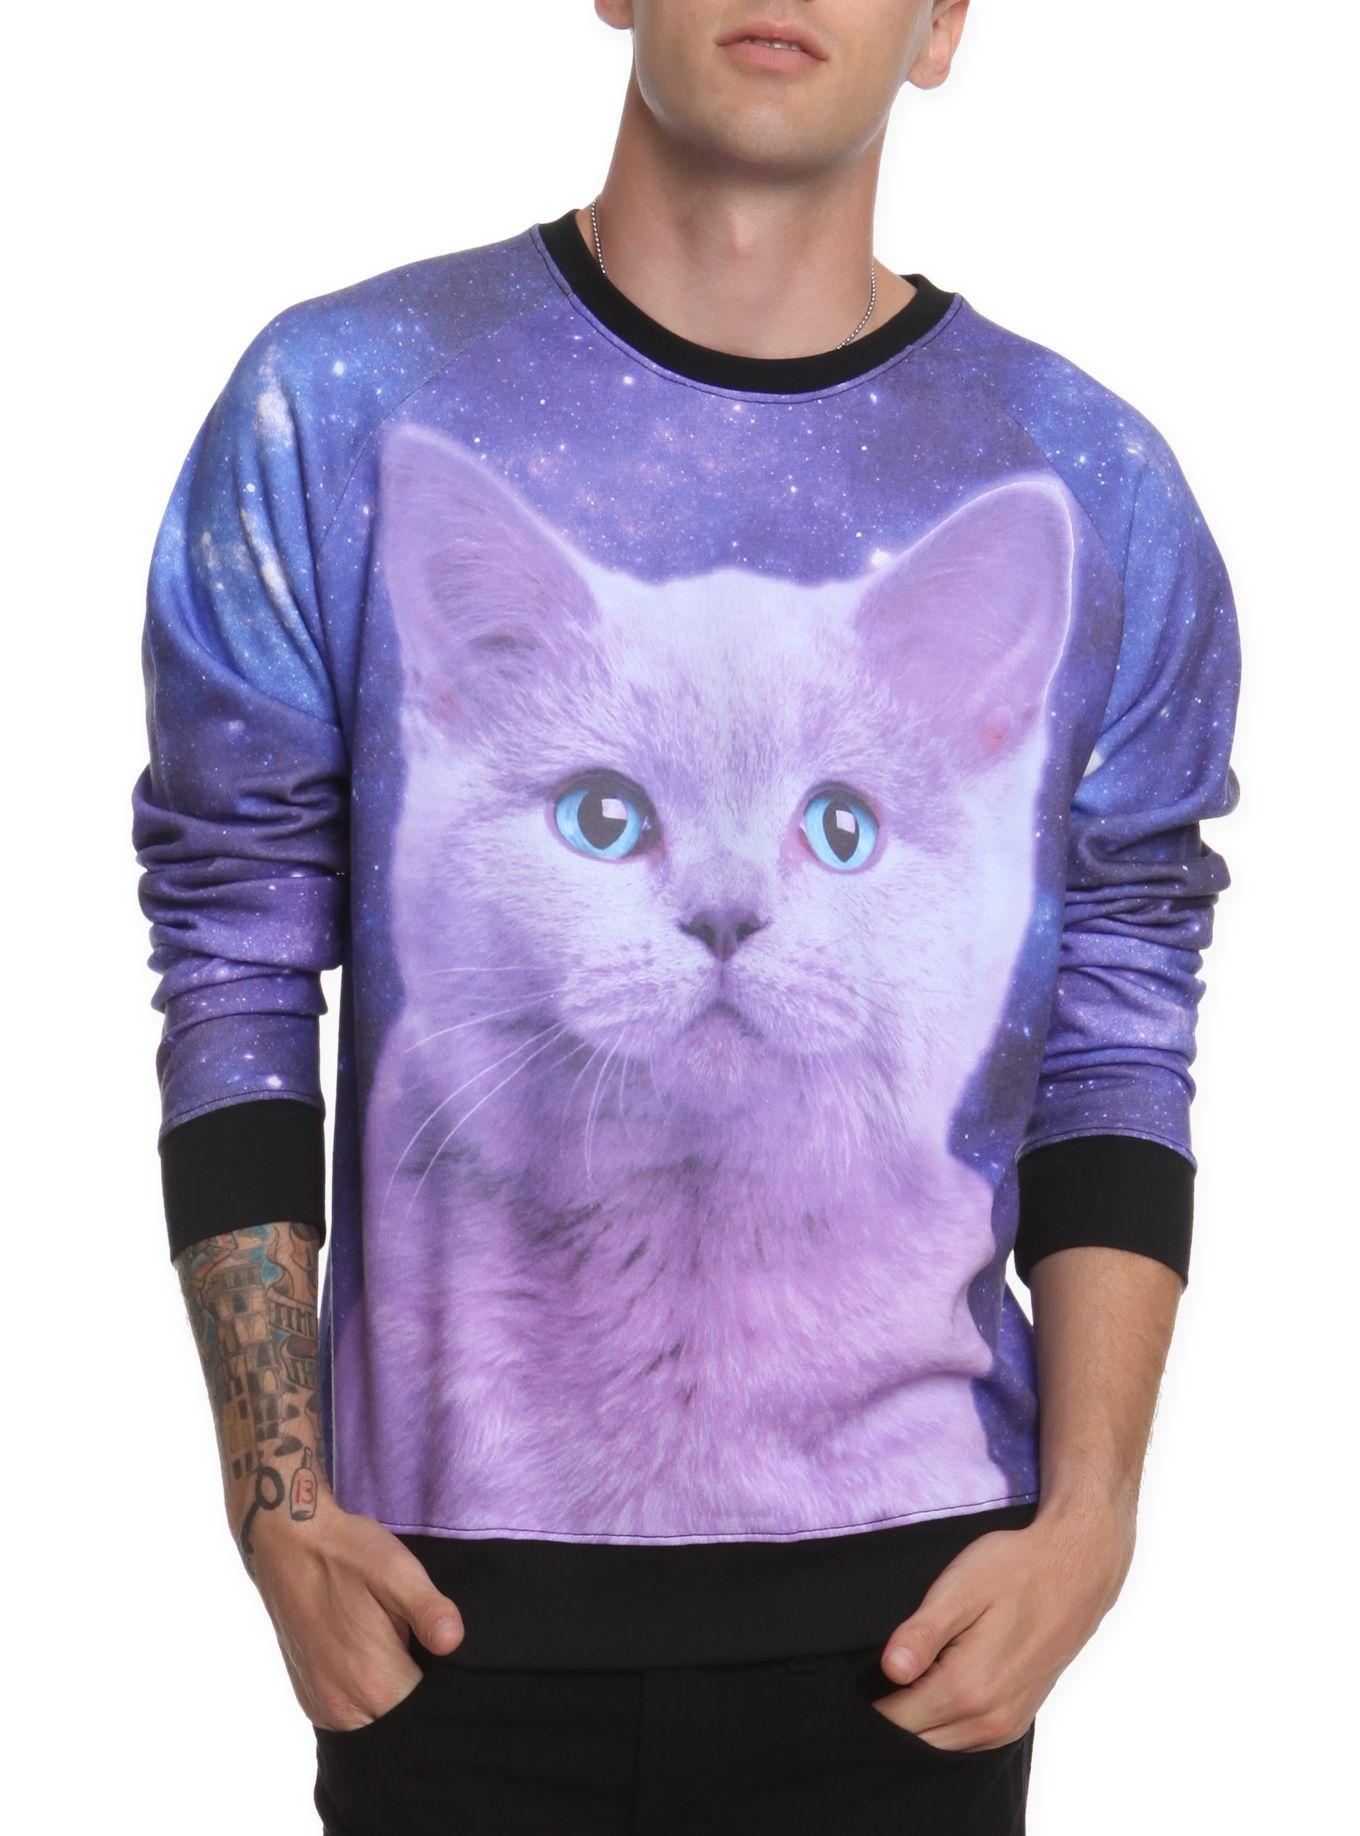 Space Kitty Crewneck Sweatshirt Hot Topic Cat Sweaters Crew Neck Sweatshirt Sweatshirts [ 1836 x 1360 Pixel ]